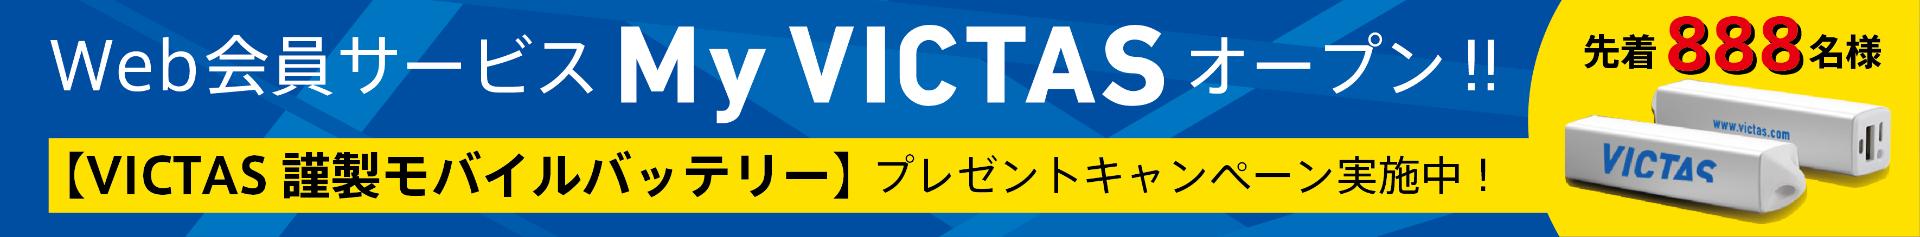 VICTAS謹製モバイルバッテリーをプレゼント